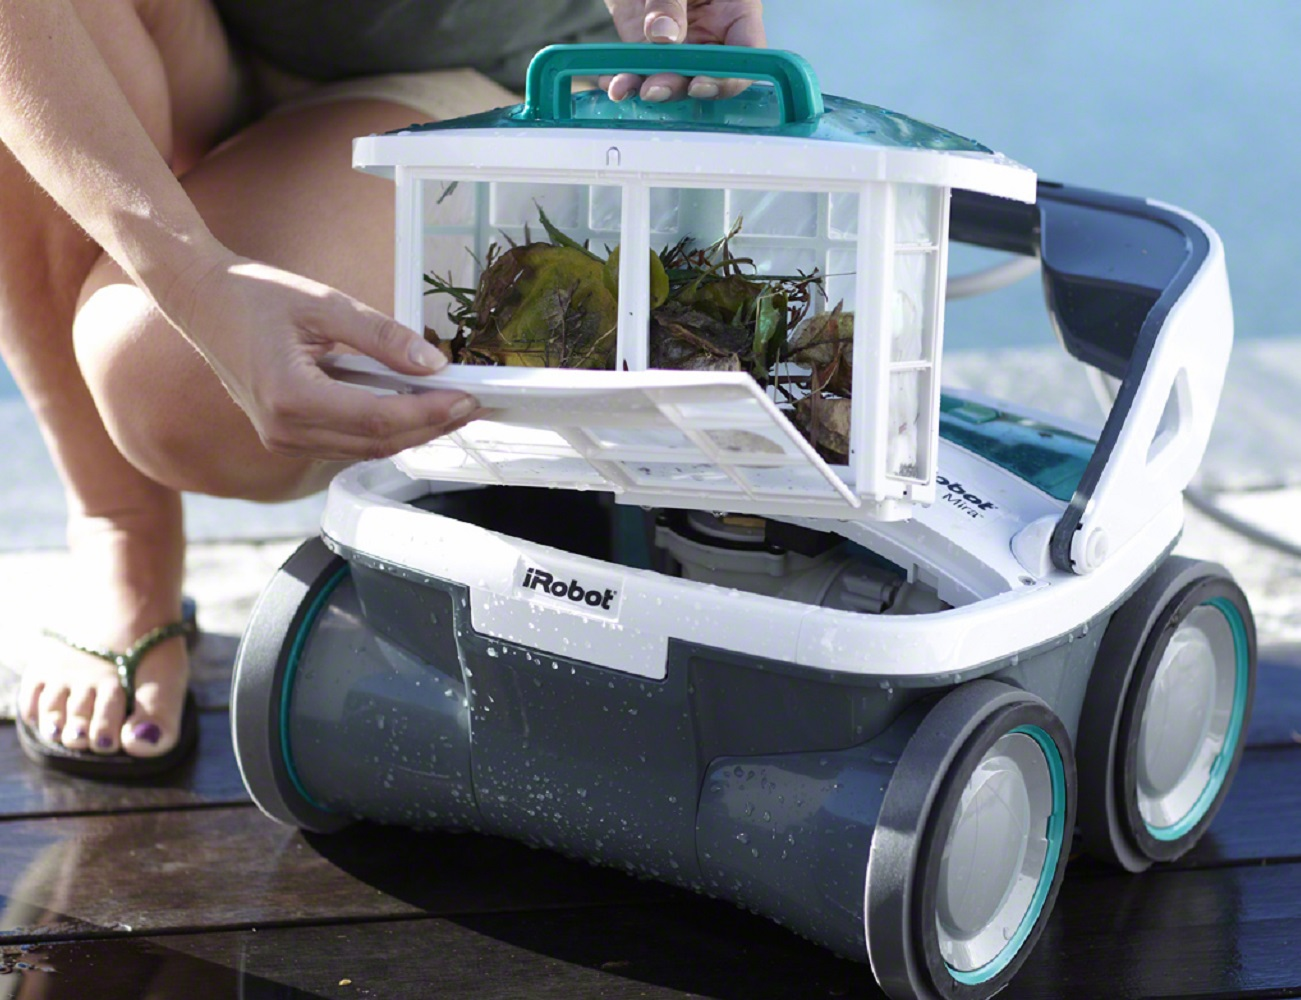 Irobot Mirra 530 Pool Cleaning Robot Gadget Flow